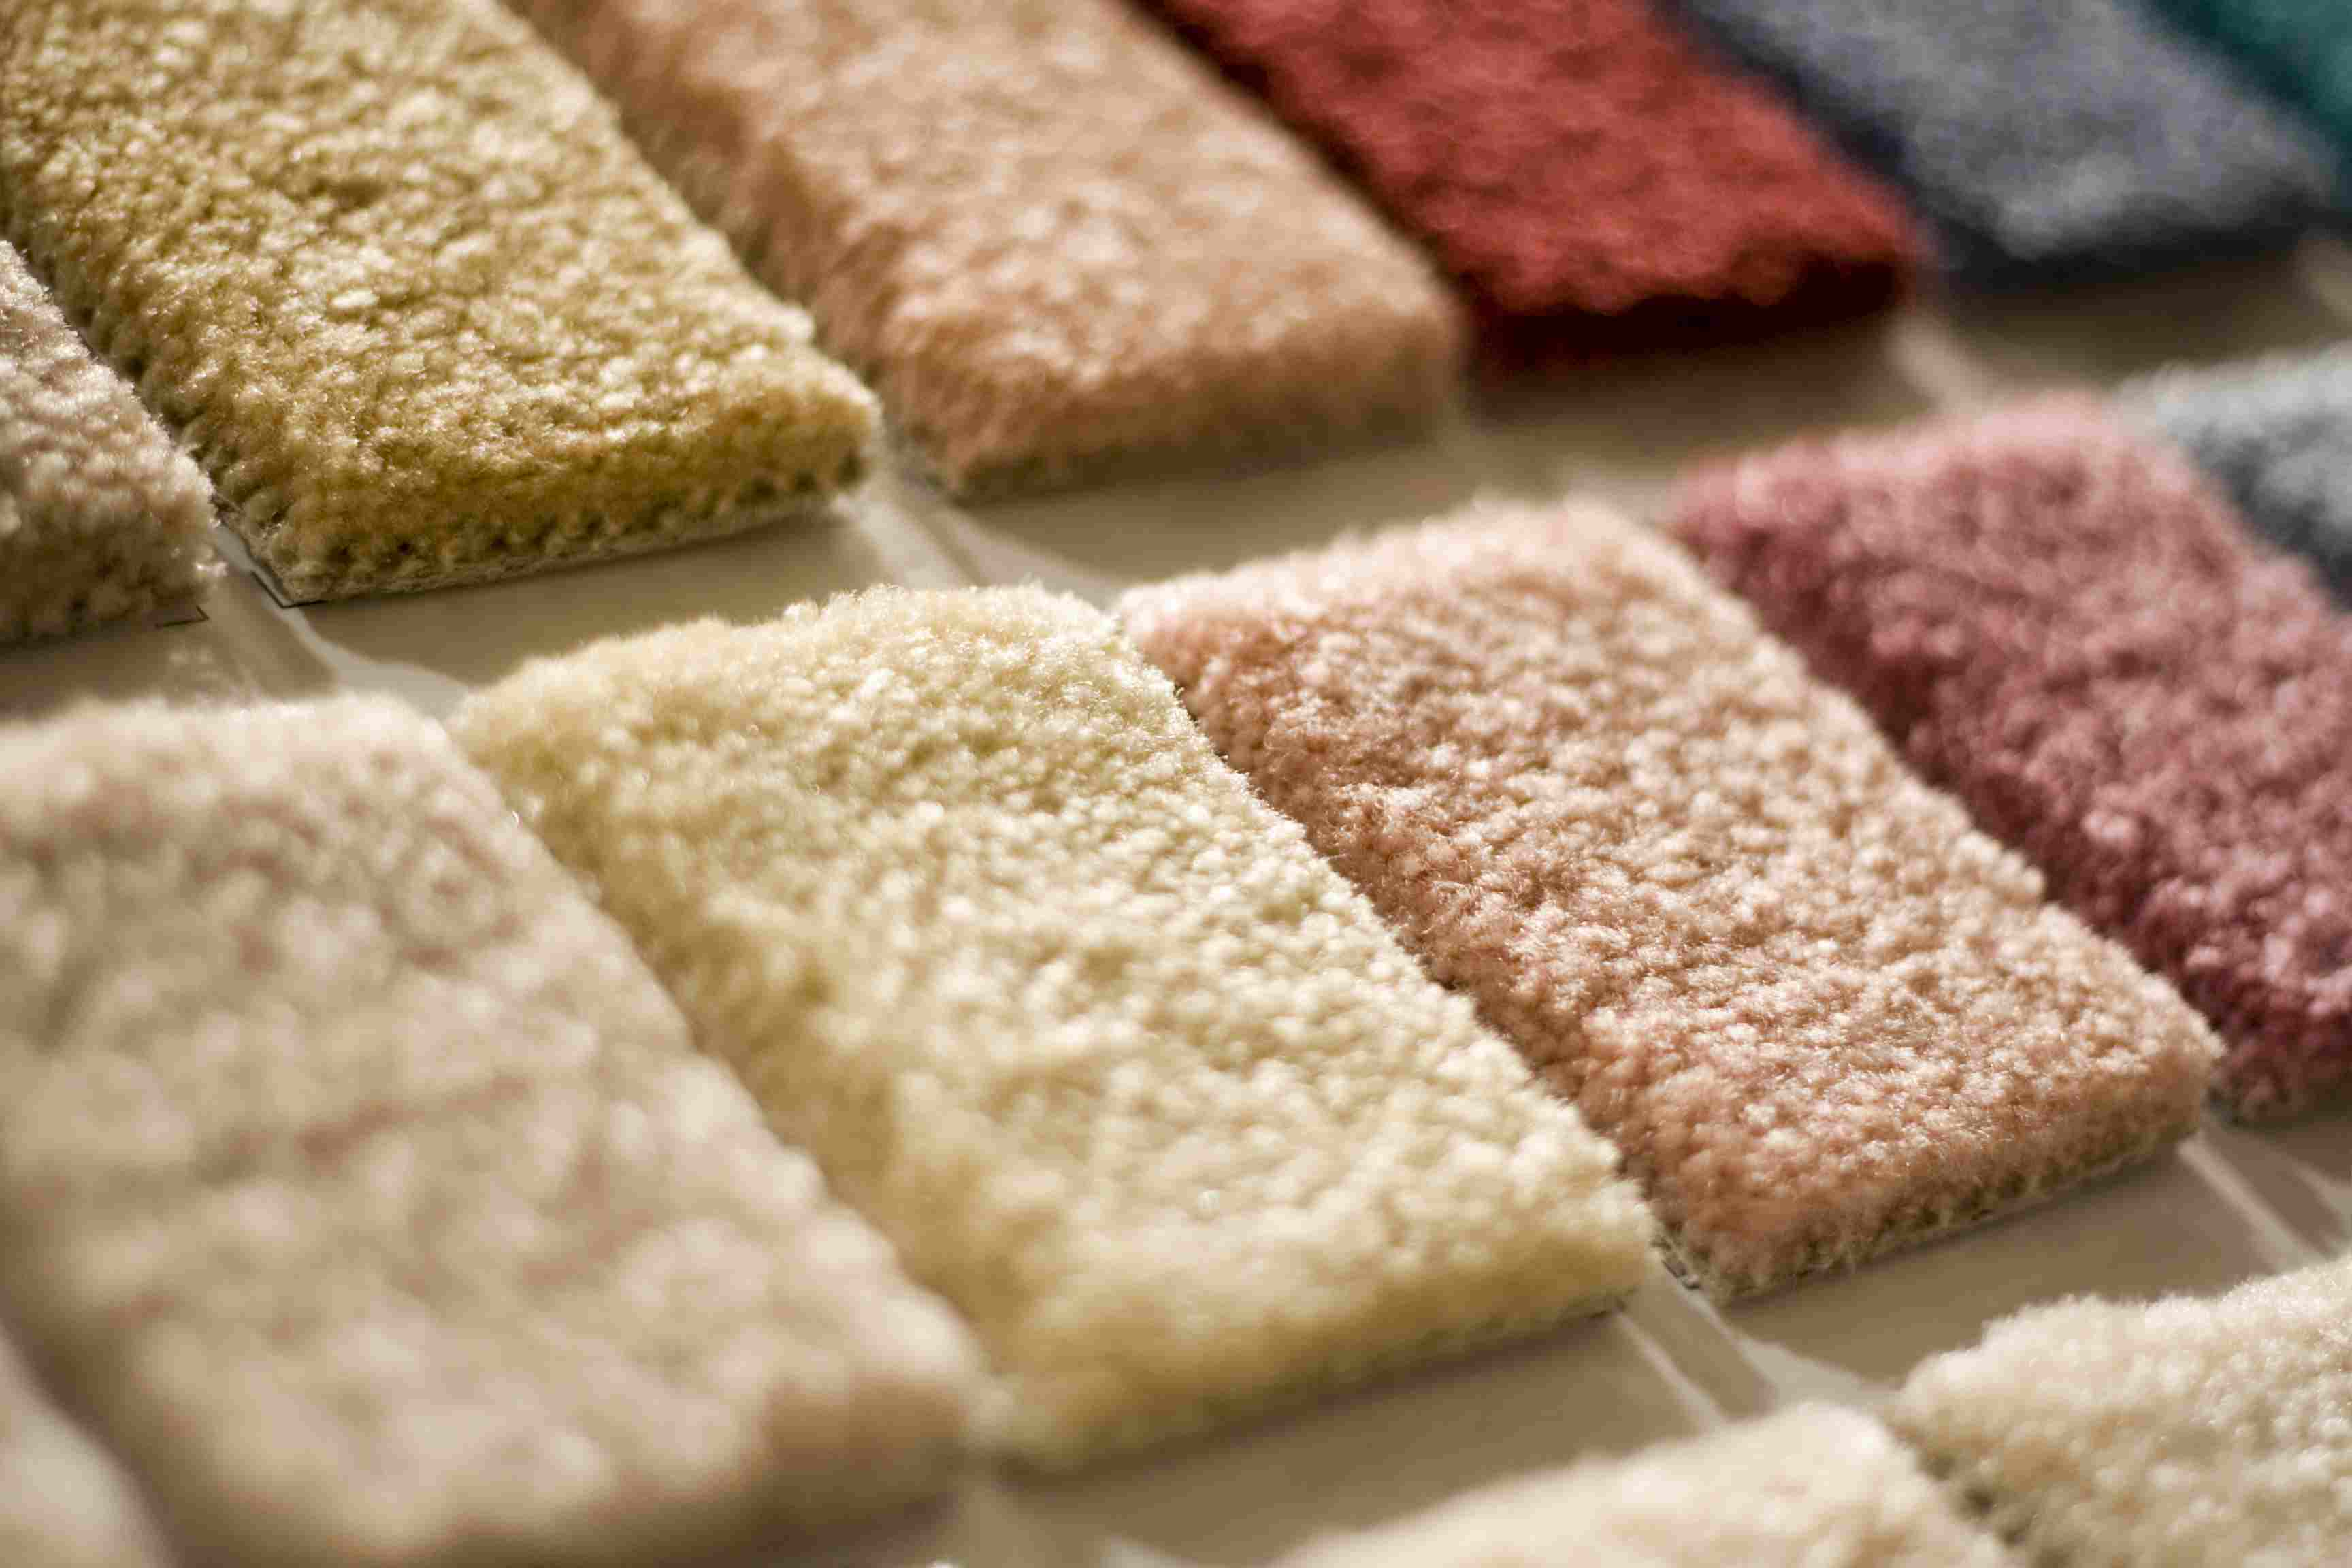 A carpet sample board viewed up-close